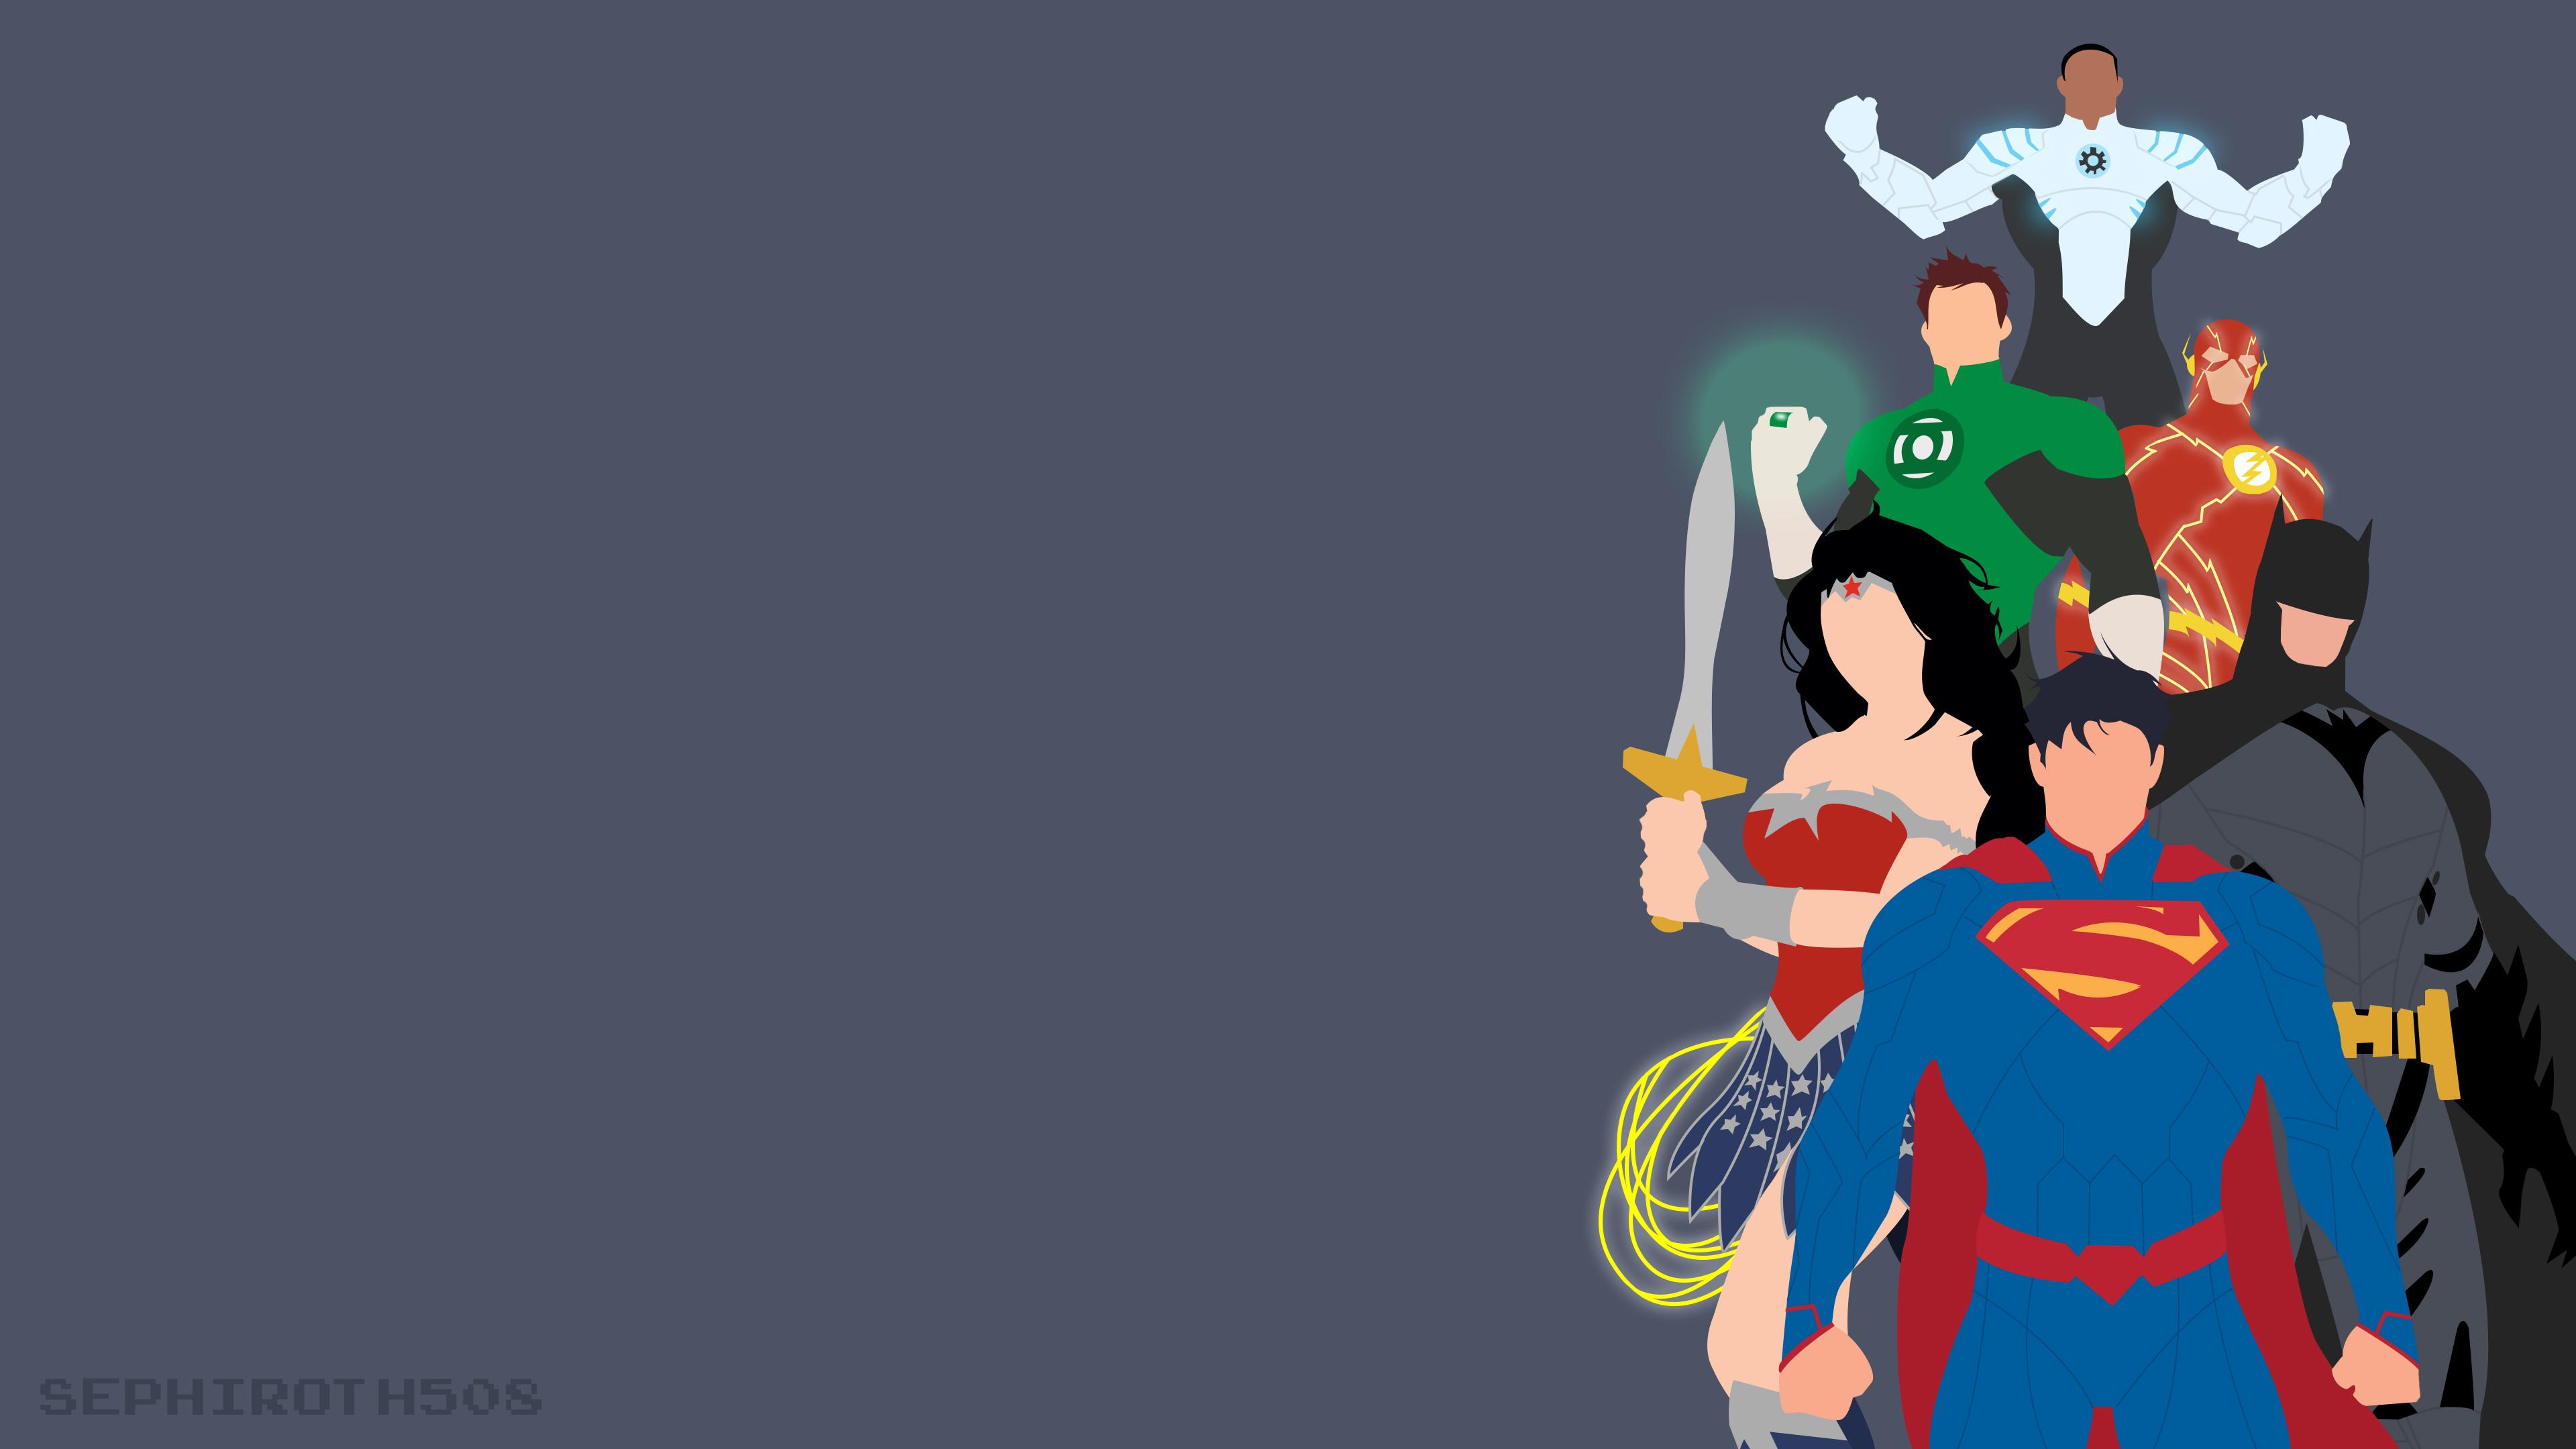 Justice League Minimalist HD Superheroes 4k Wallpapers Images